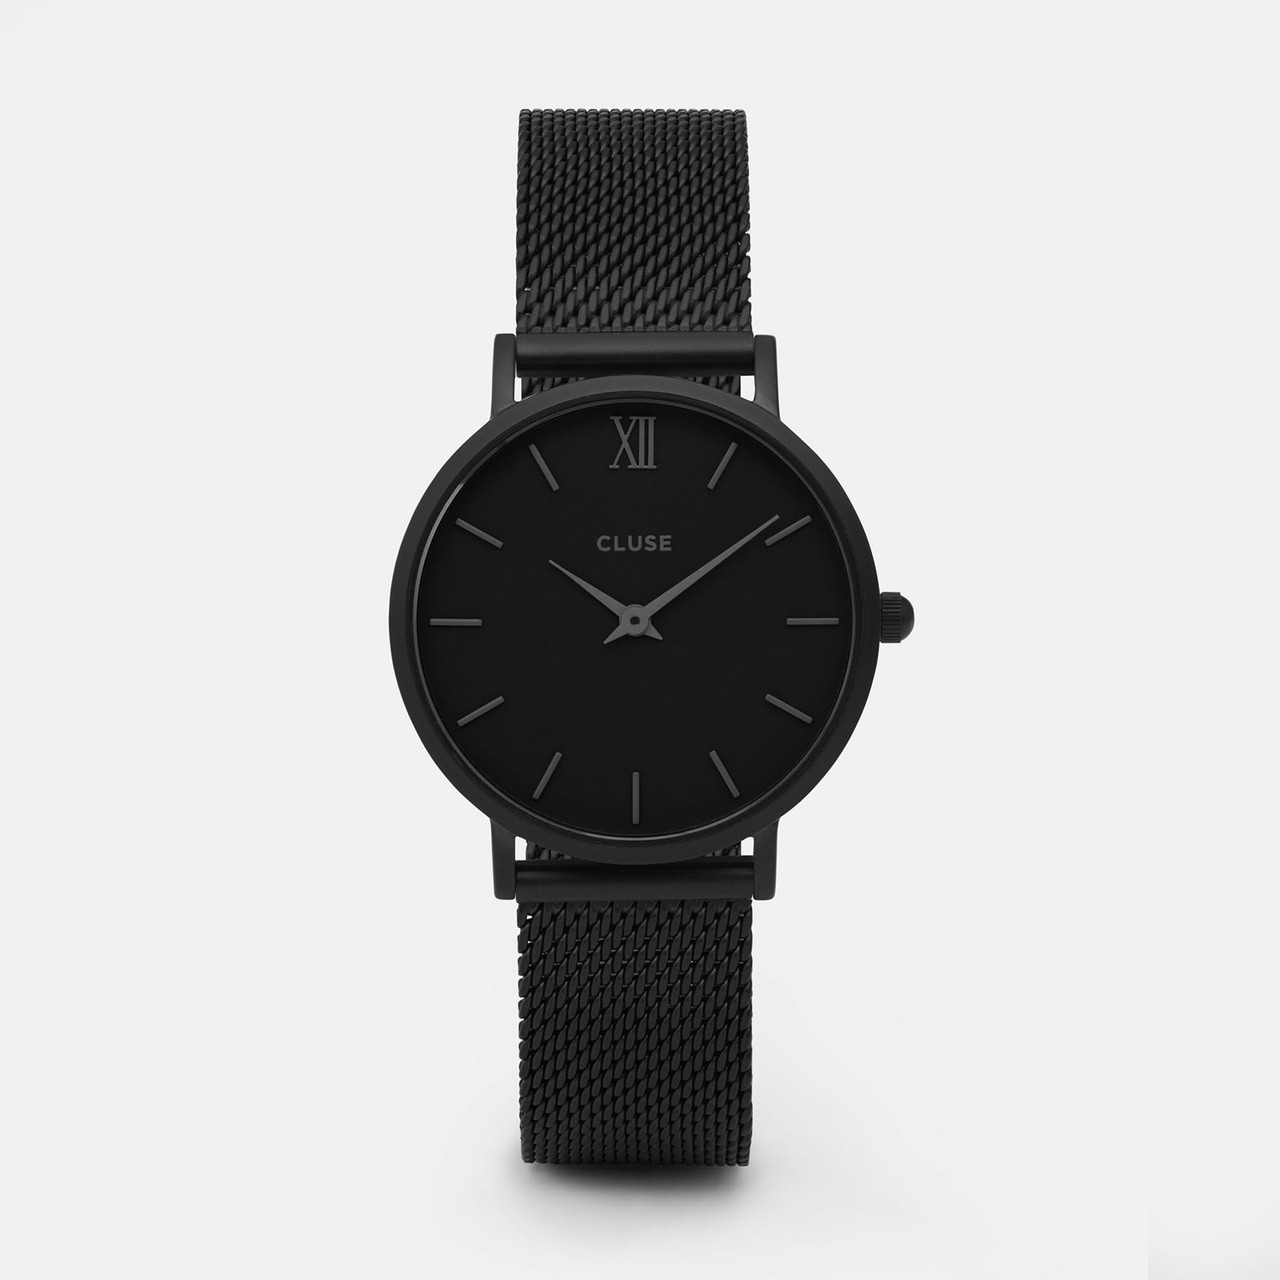 Cluse Minuit Mesh Full Black Watch CL30011  c4b19da55be